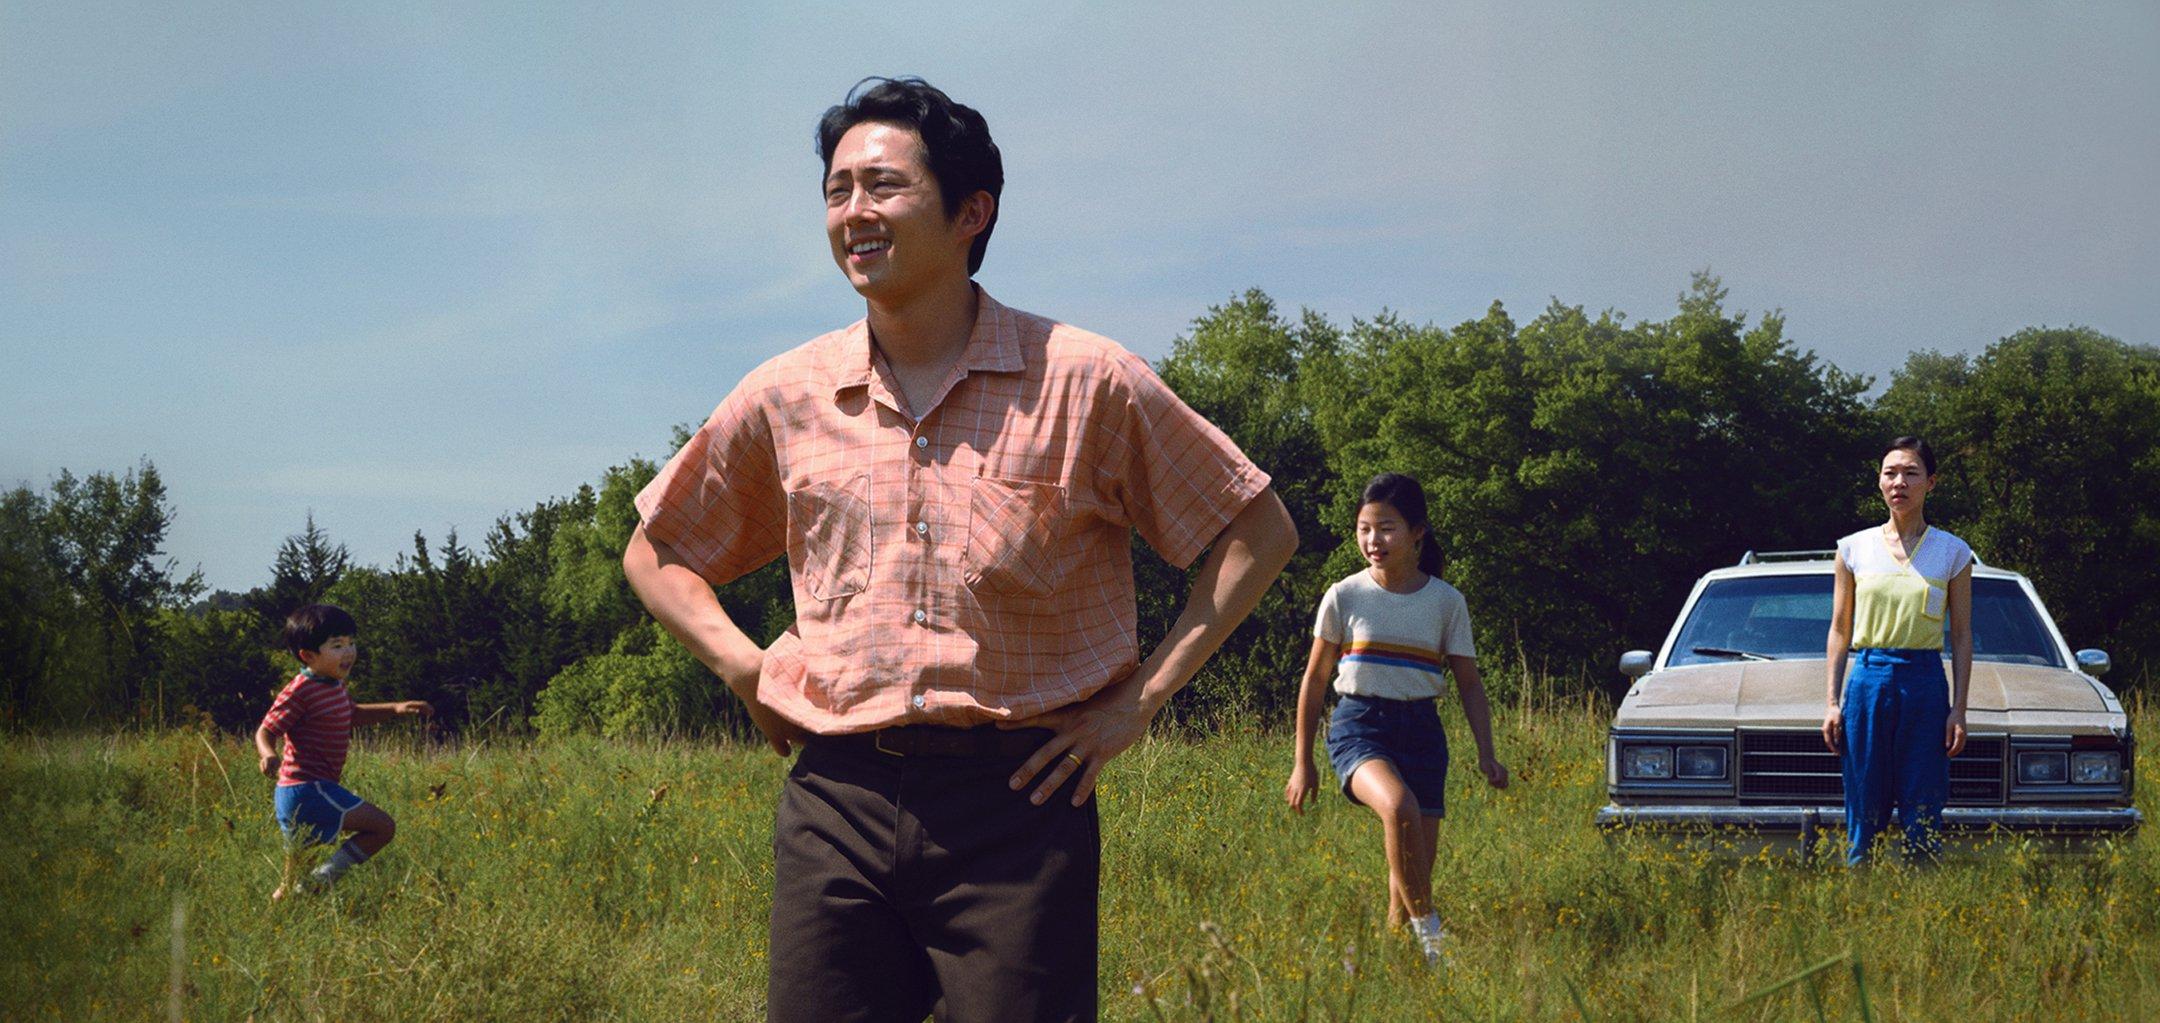 Steven Yeun as Jacob and the family in 'Minari' (2020)